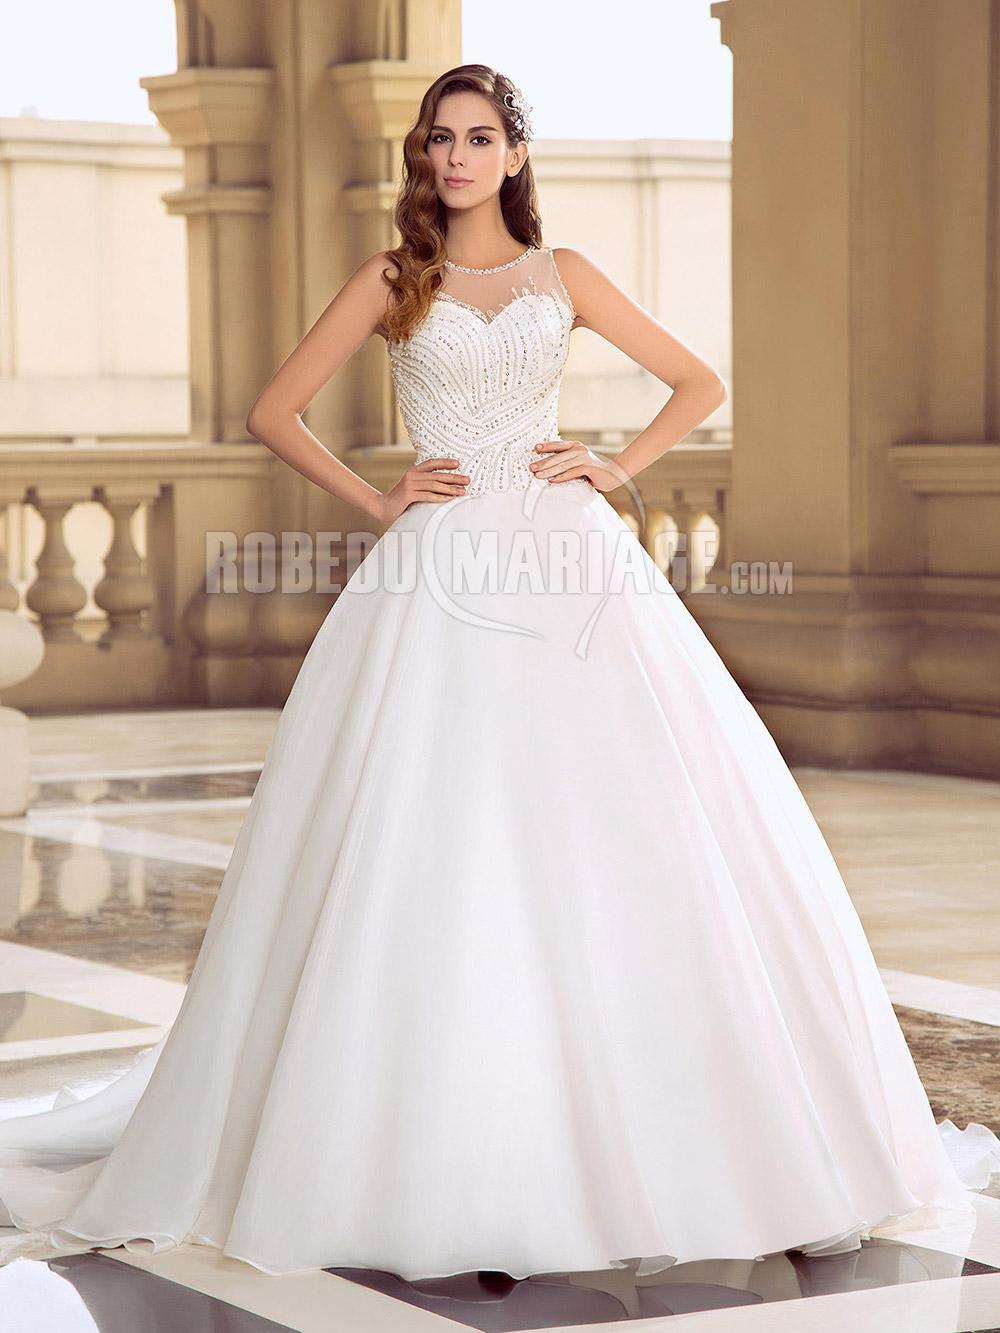 Accueil > Robe de mariage > Robe de mariée 2016 > Robe de mariée ...